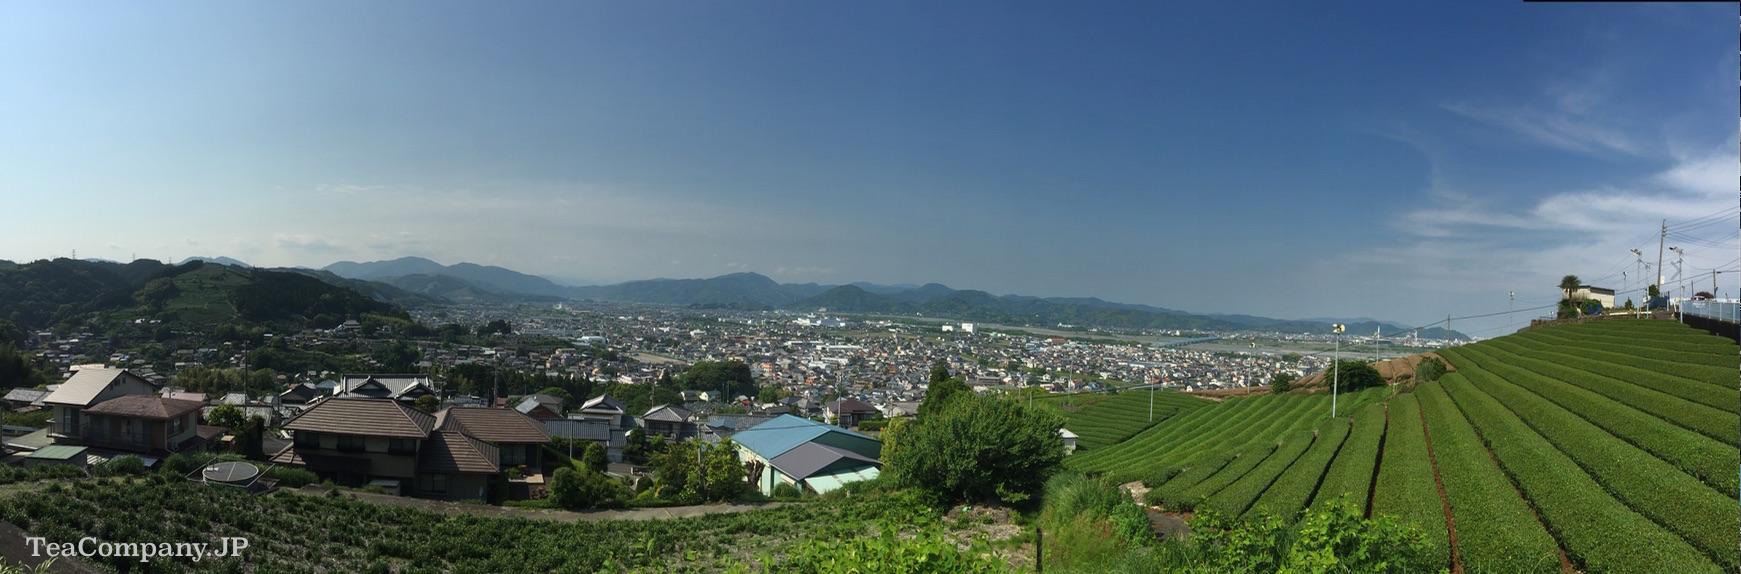 Каная, Сидзуока, Япония